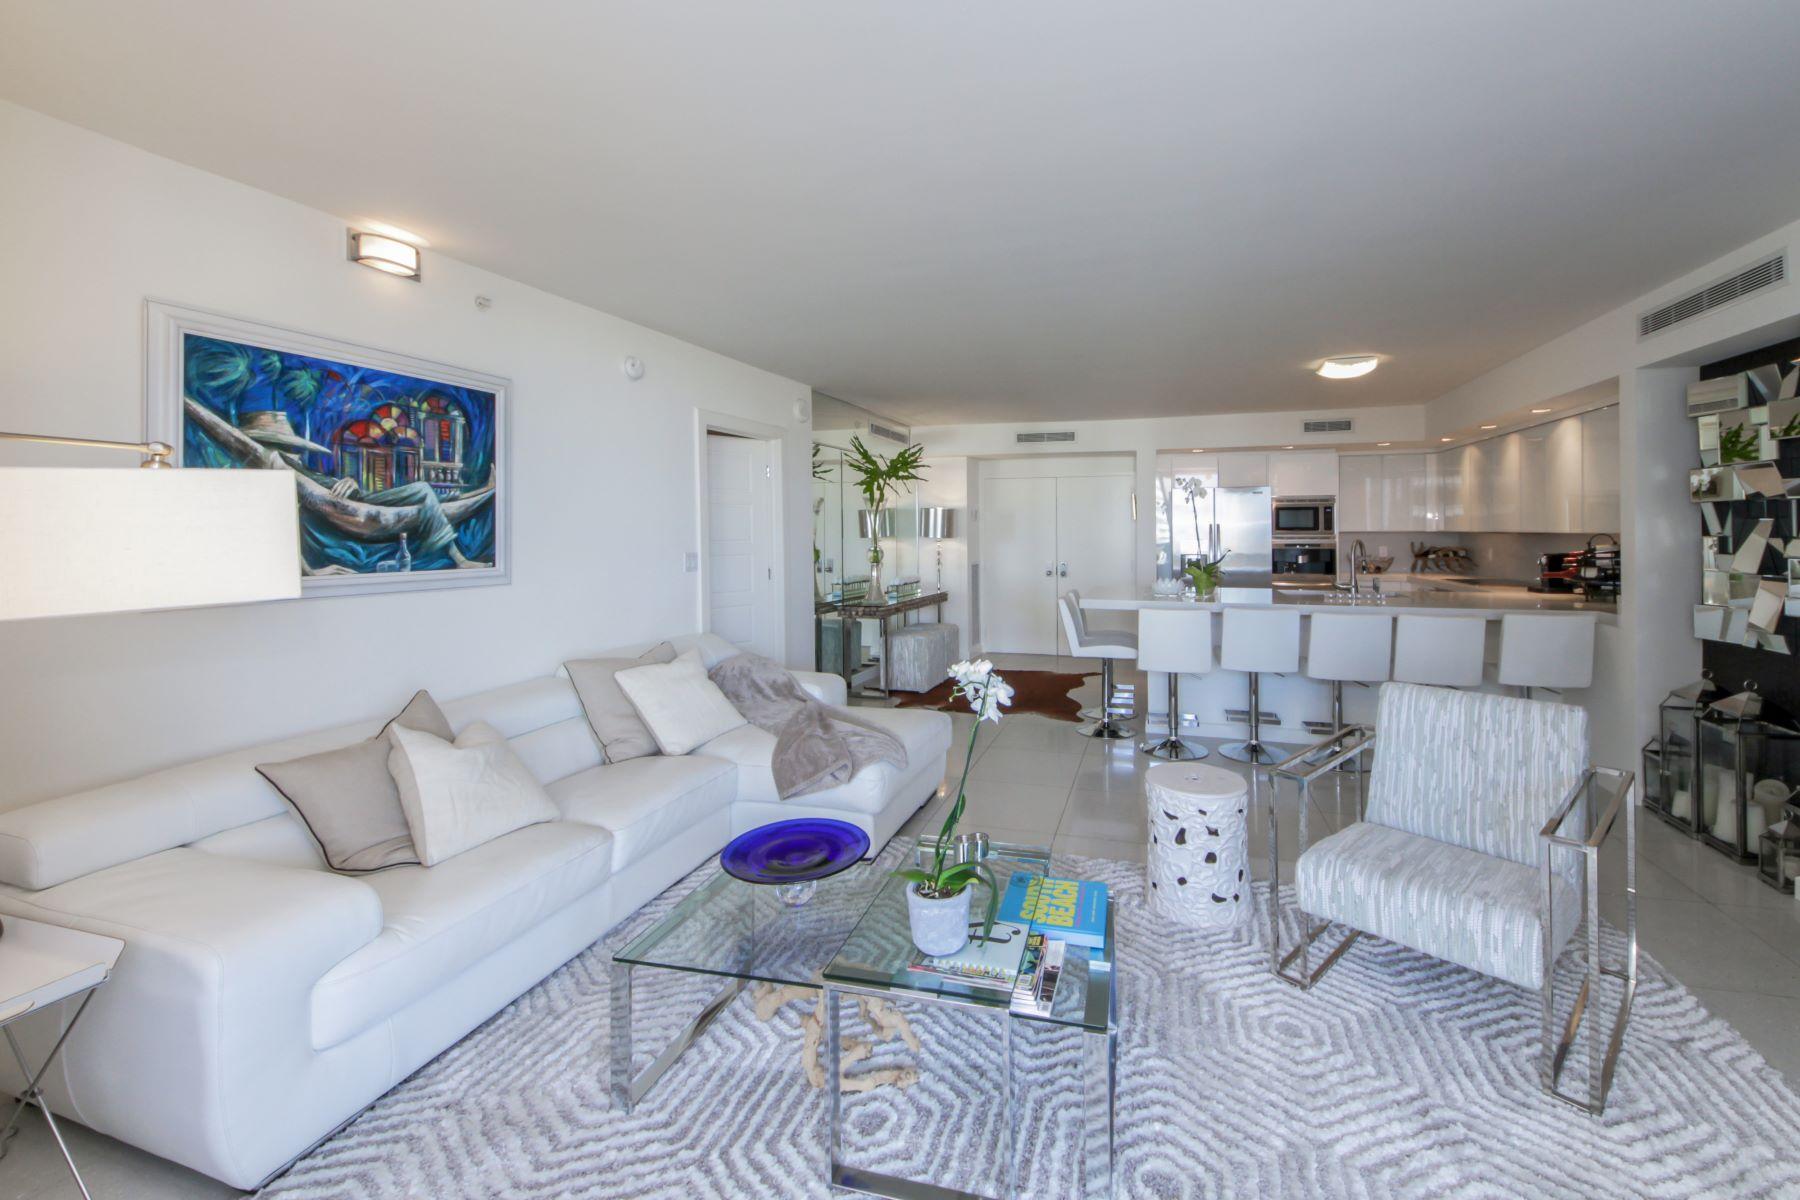 Condominium for Sale at 9 Island Av #1411 9Island Av 1411 Miami Beach, Florida, 33139 United States